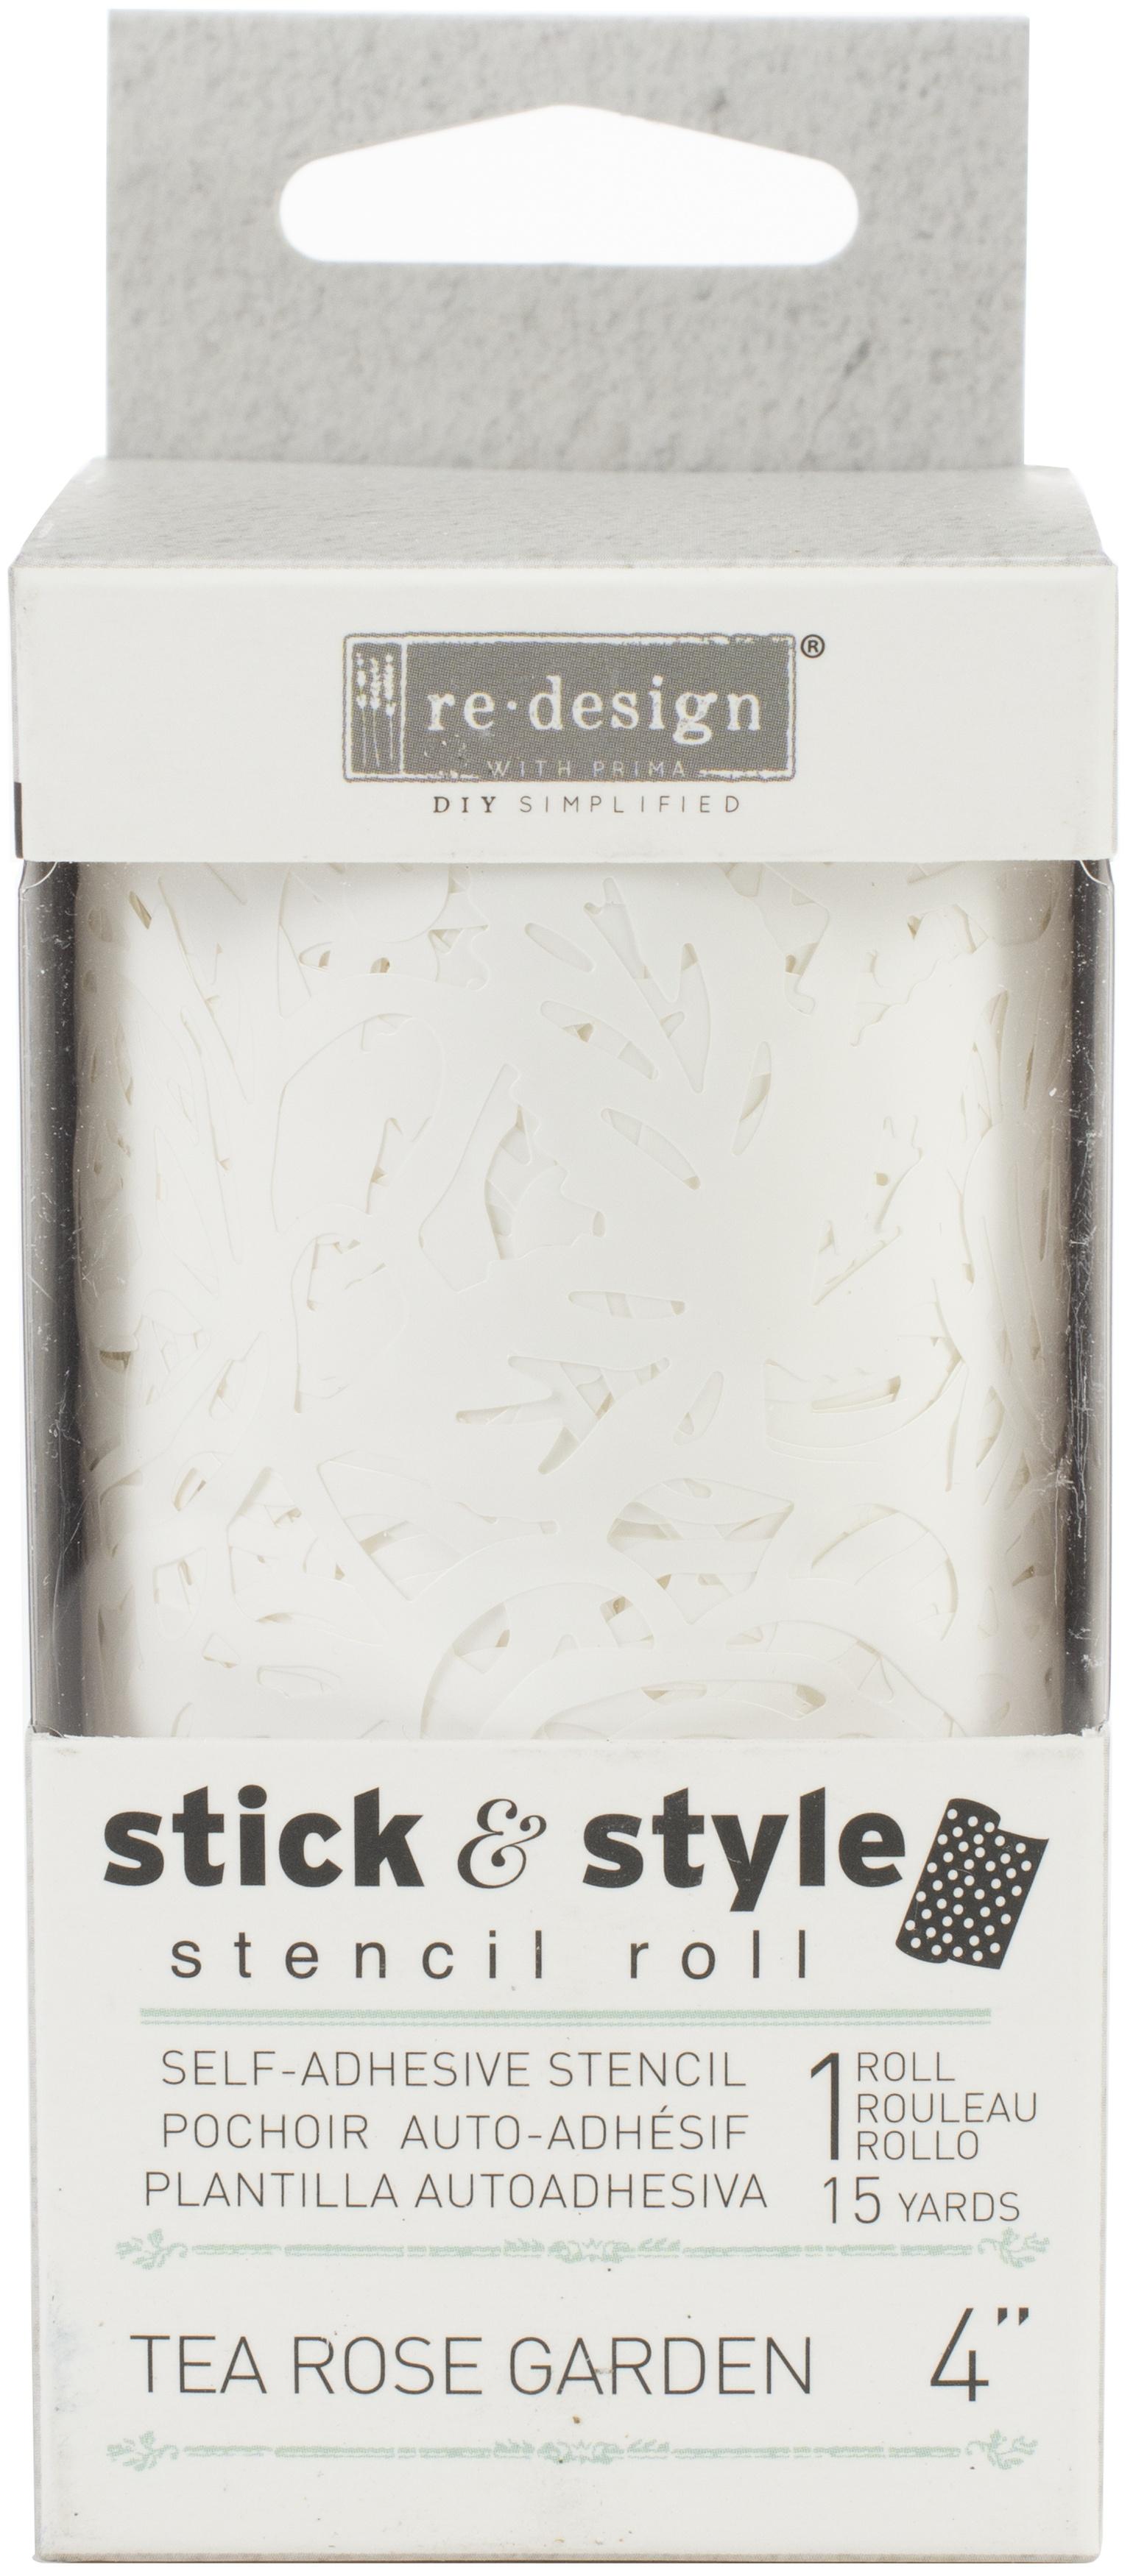 Stick & Style Tea Rose